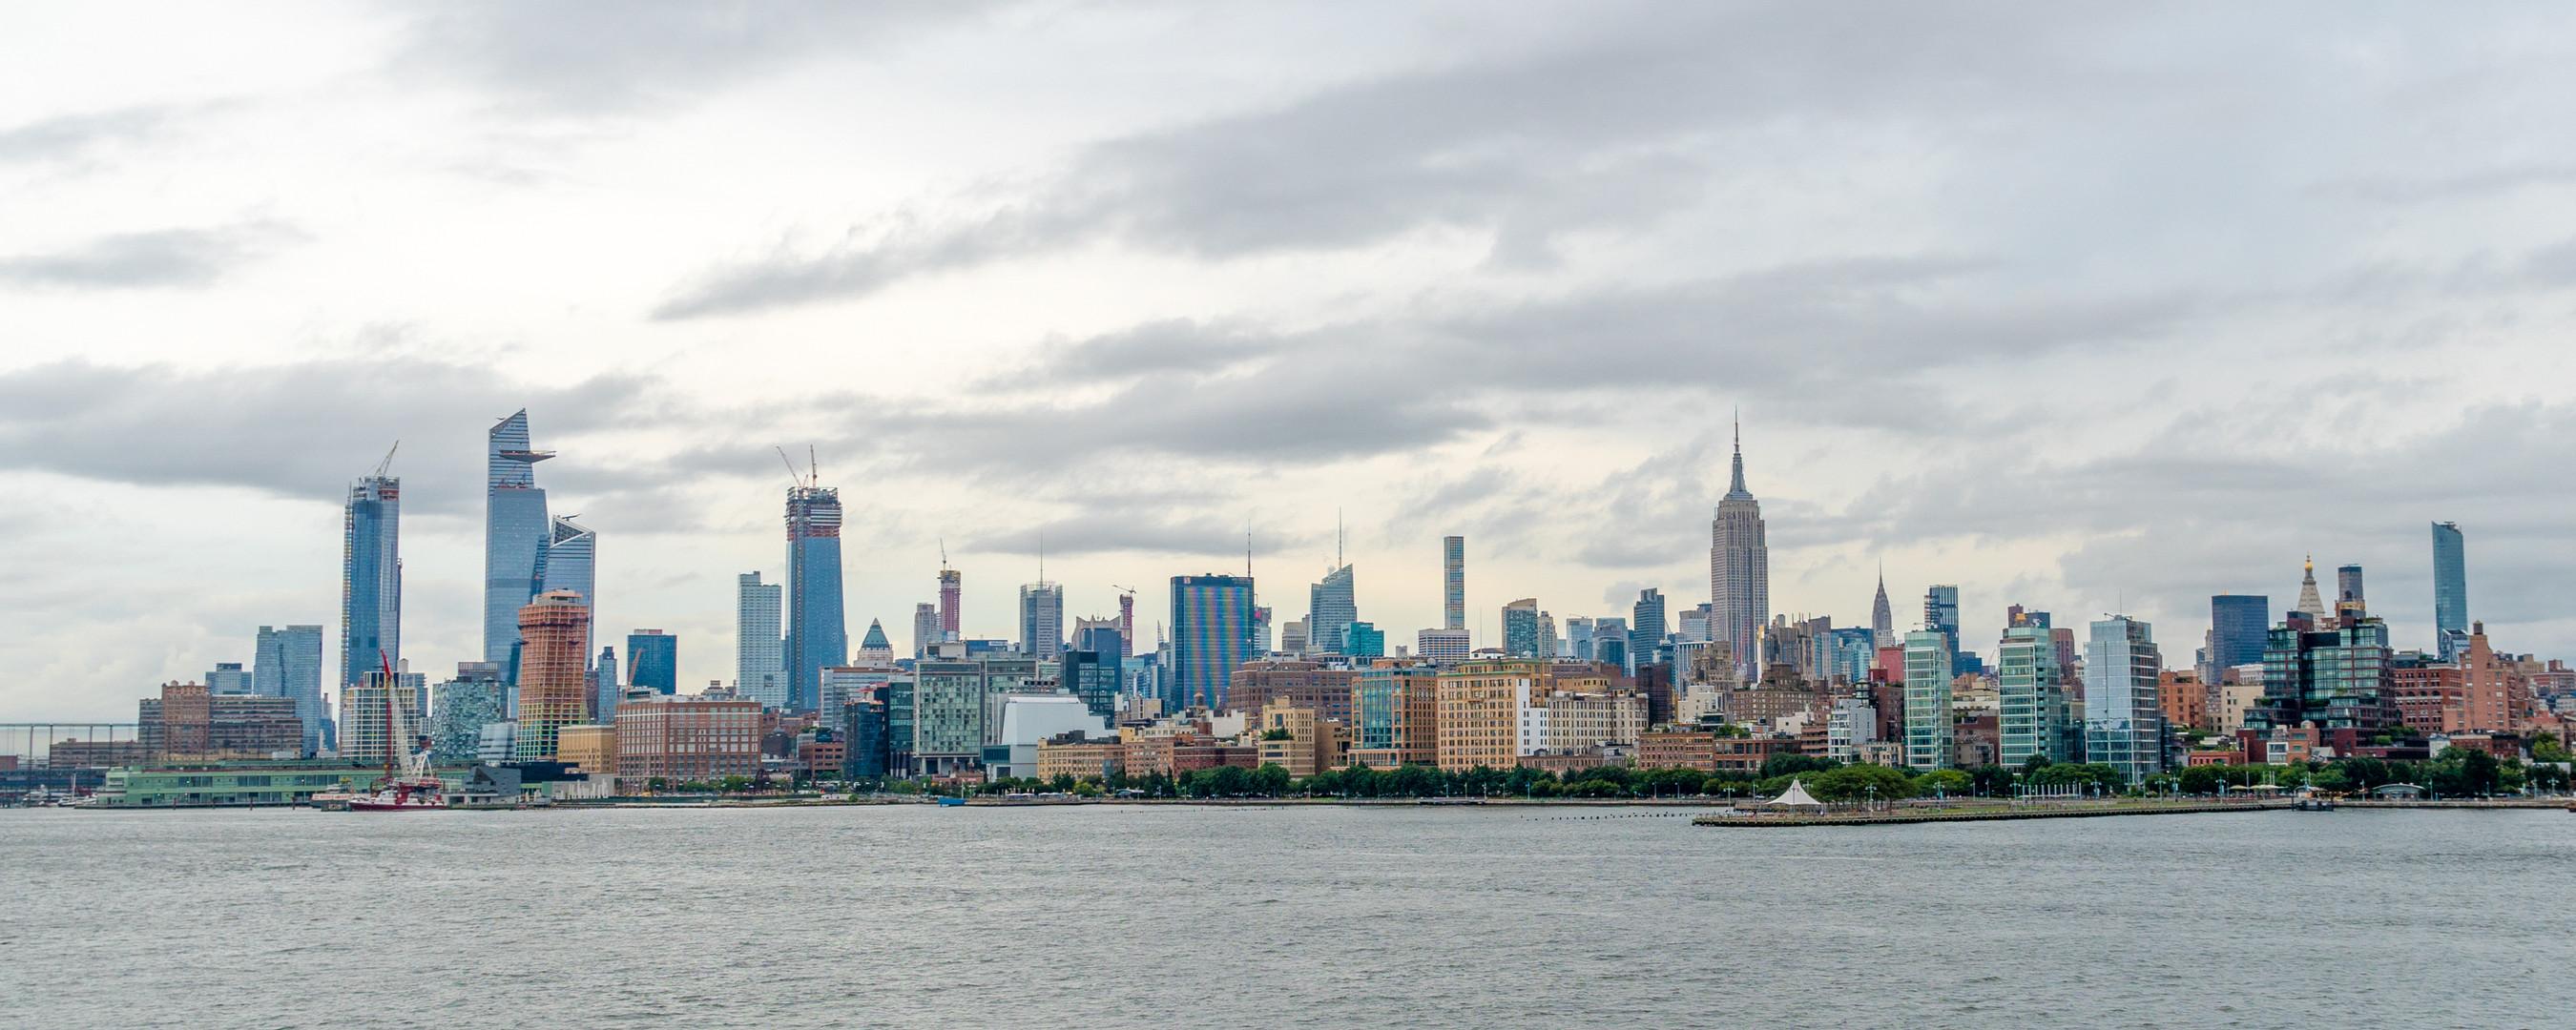 New York City - NYC